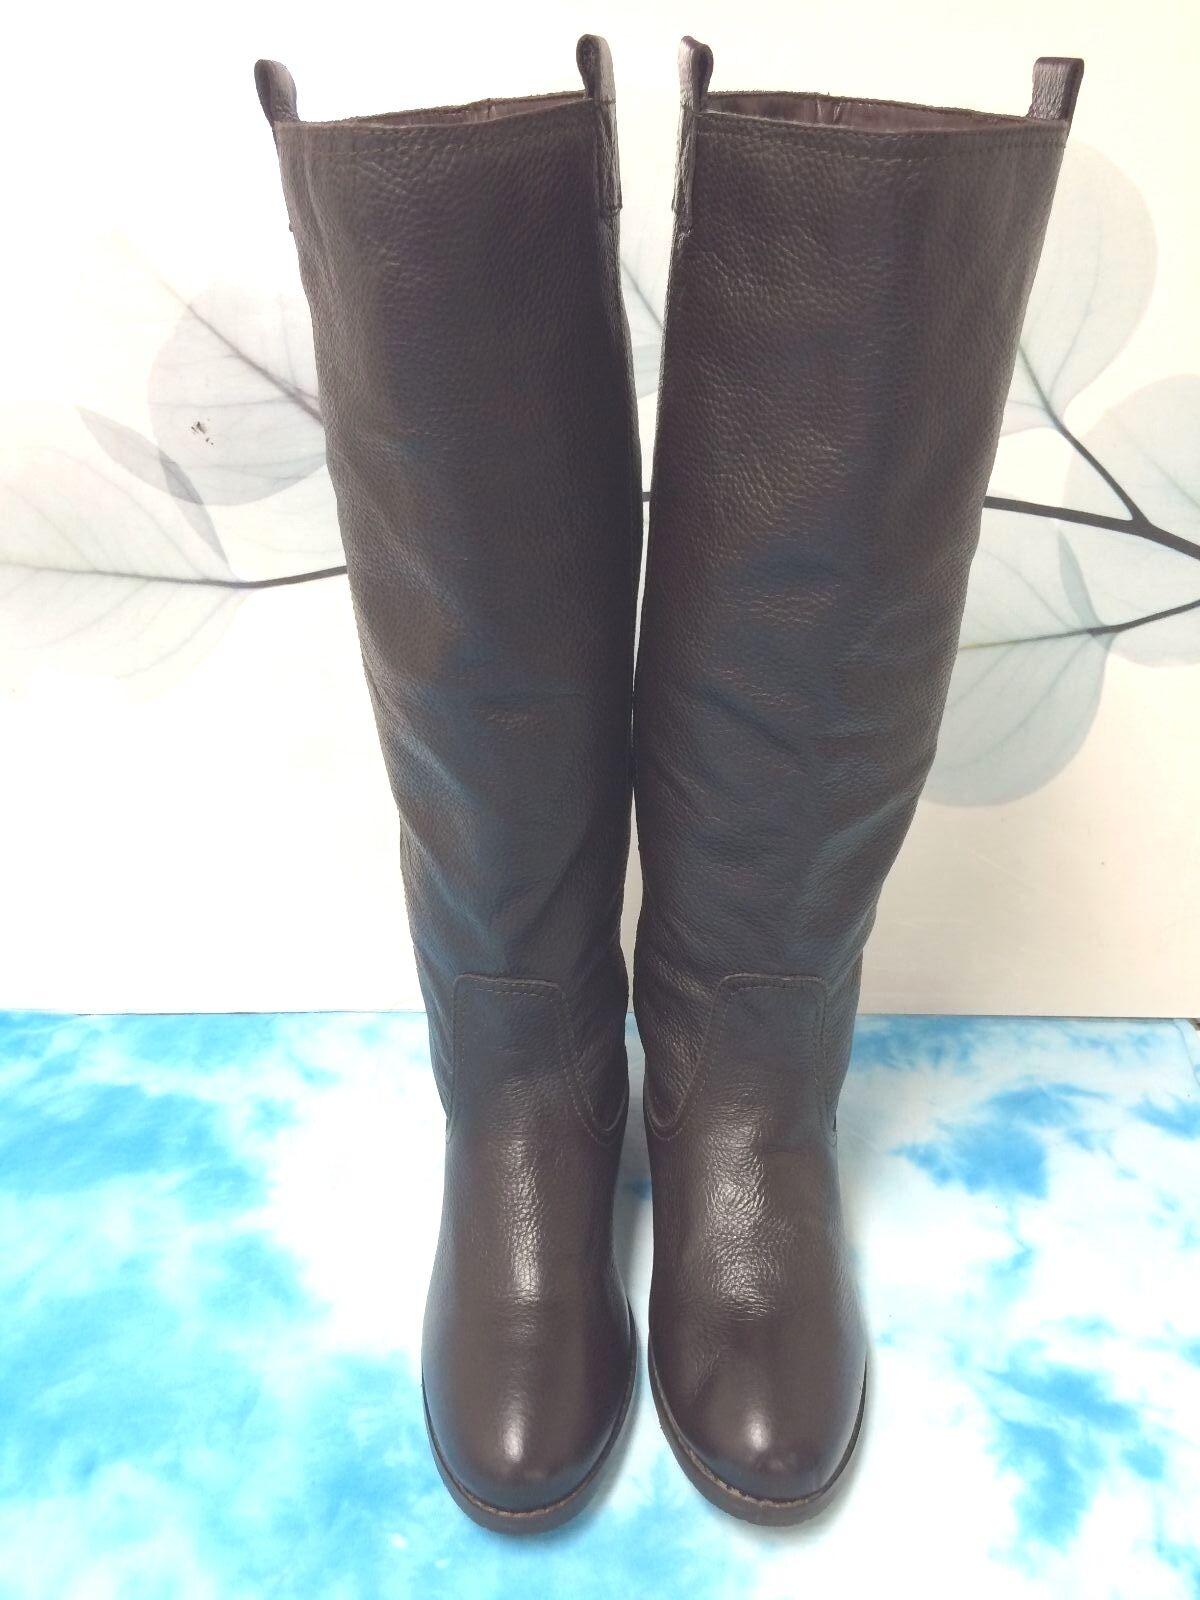 Lumiani Lumiani Lumiani Storlek 6 M bspringaaa Pebble läder stövlar kvinnor skor  fashional butik till salu